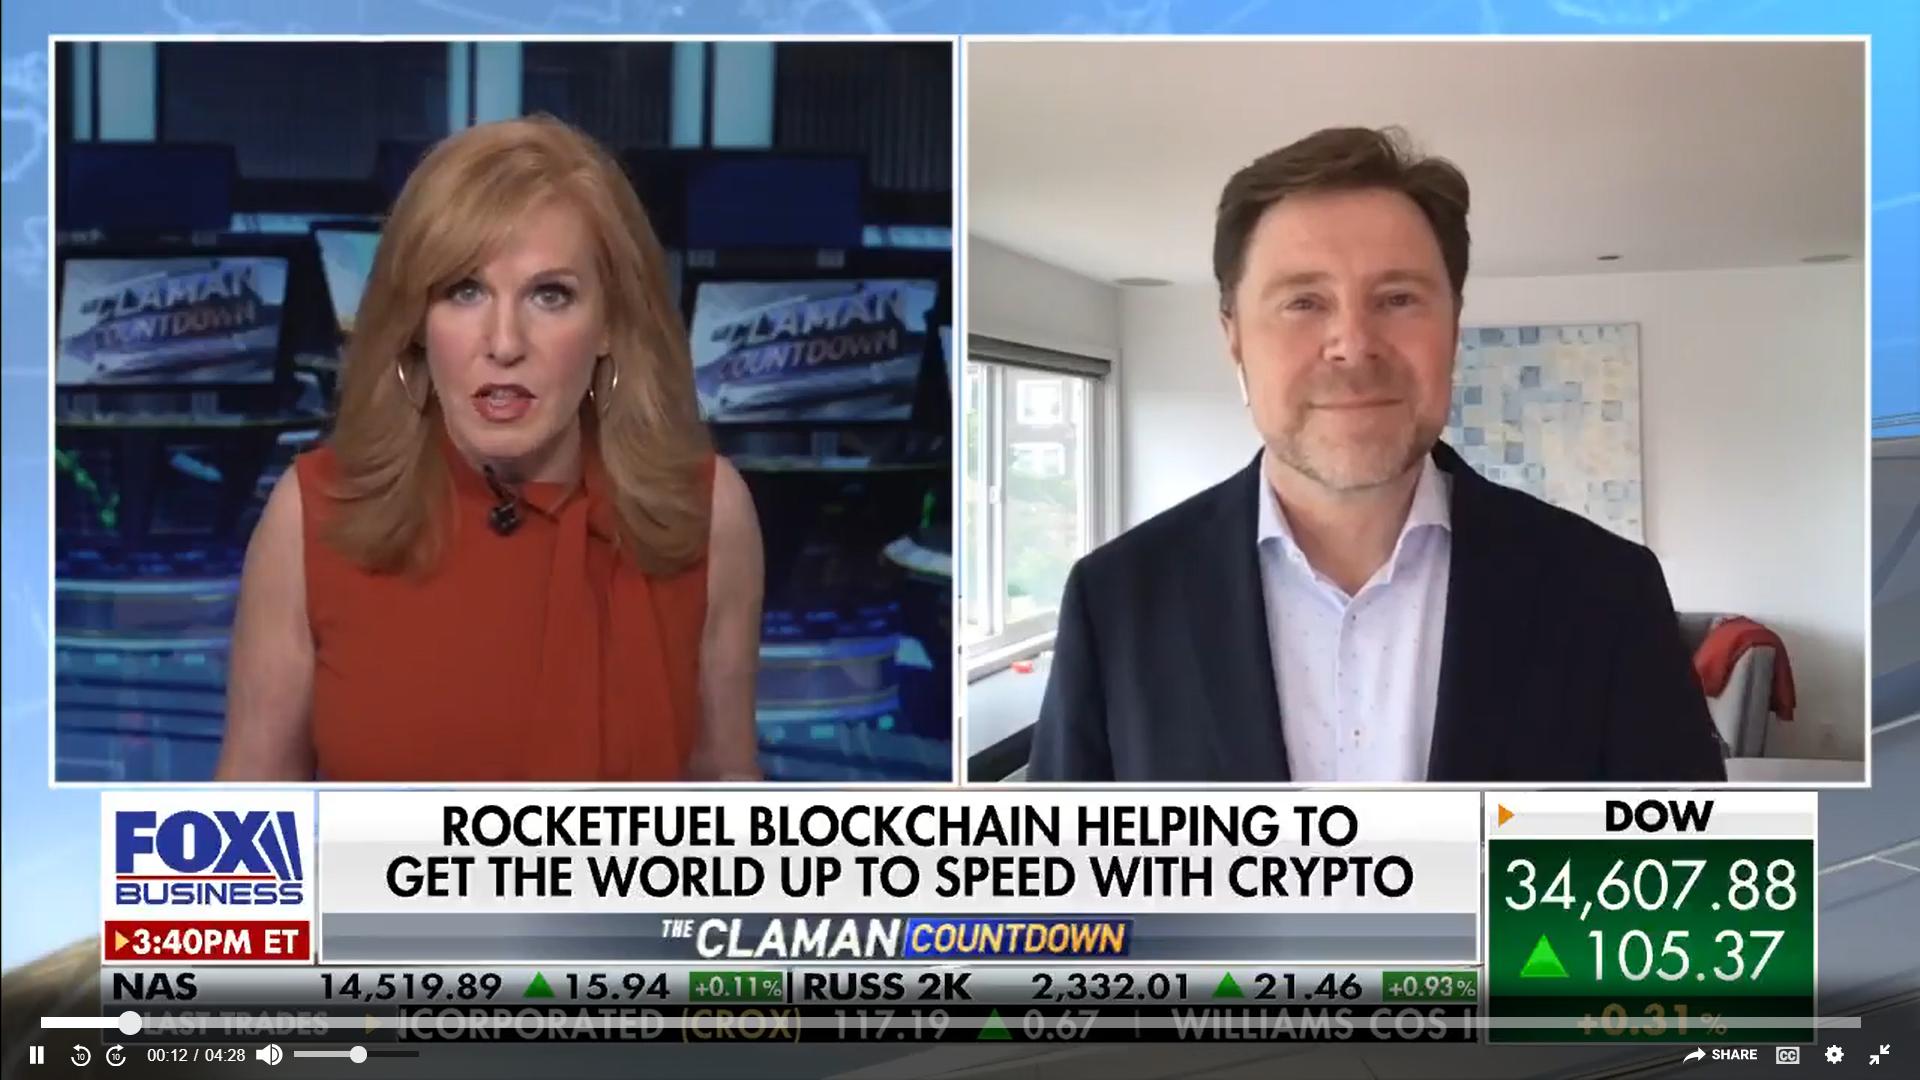 RocketFuel CEO Peter Jensen on Fox Business TV